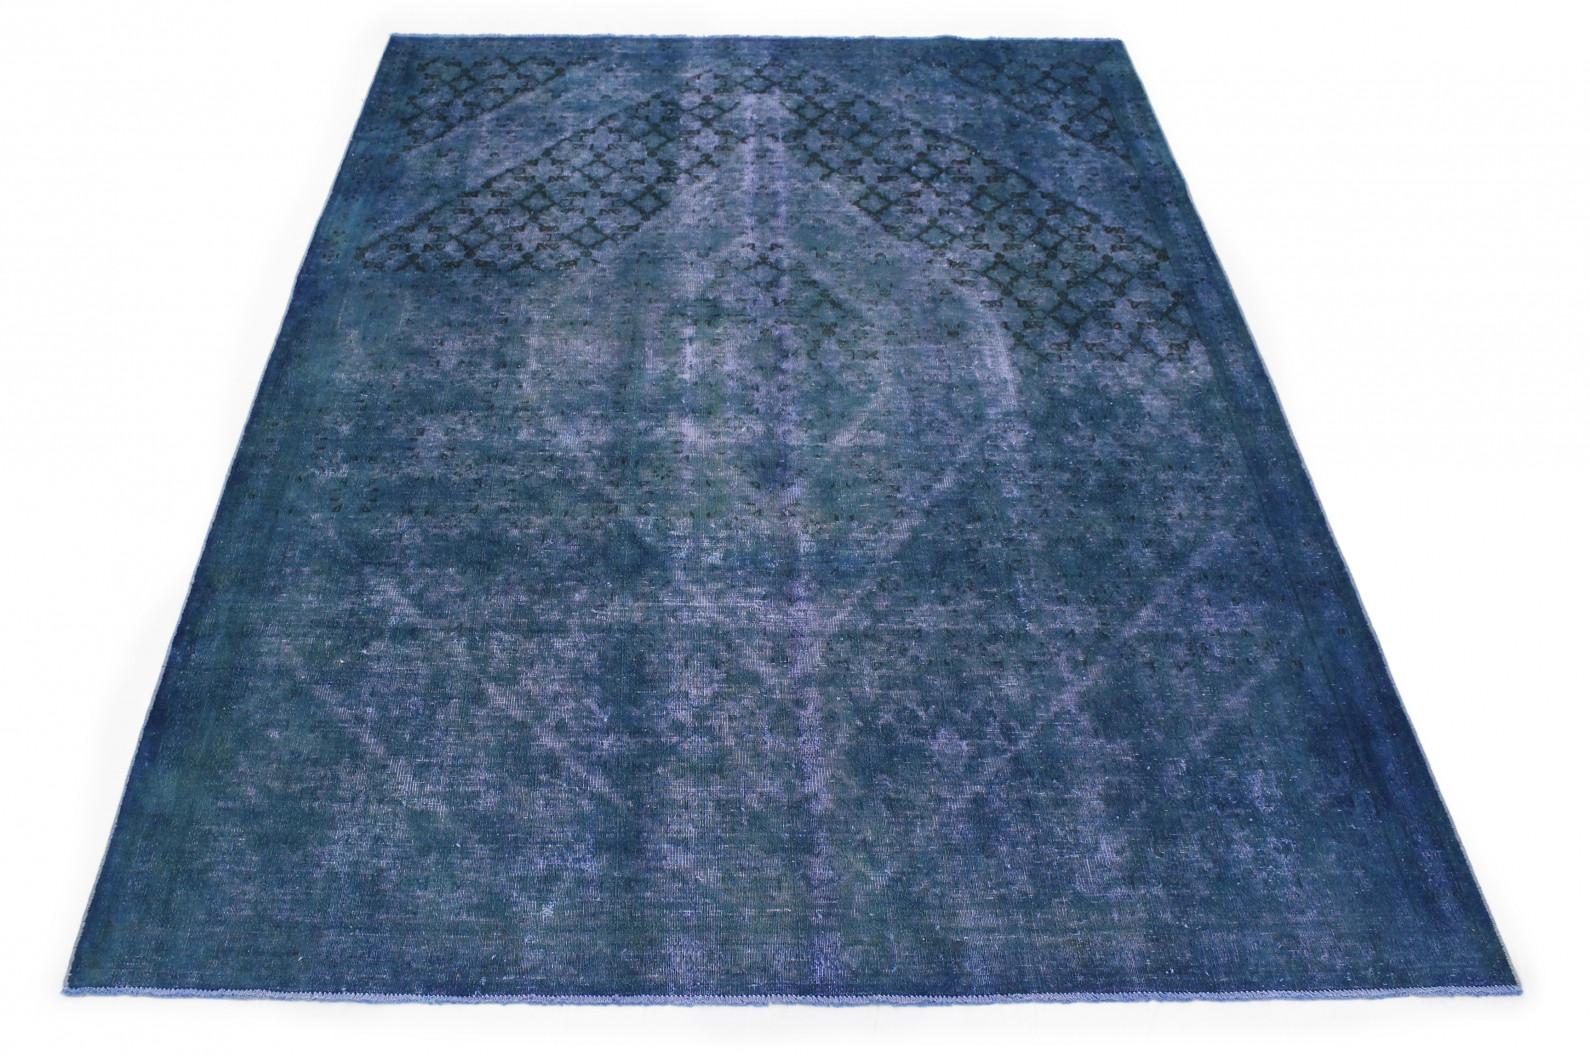 Vintage Teppich Blau in 330x220